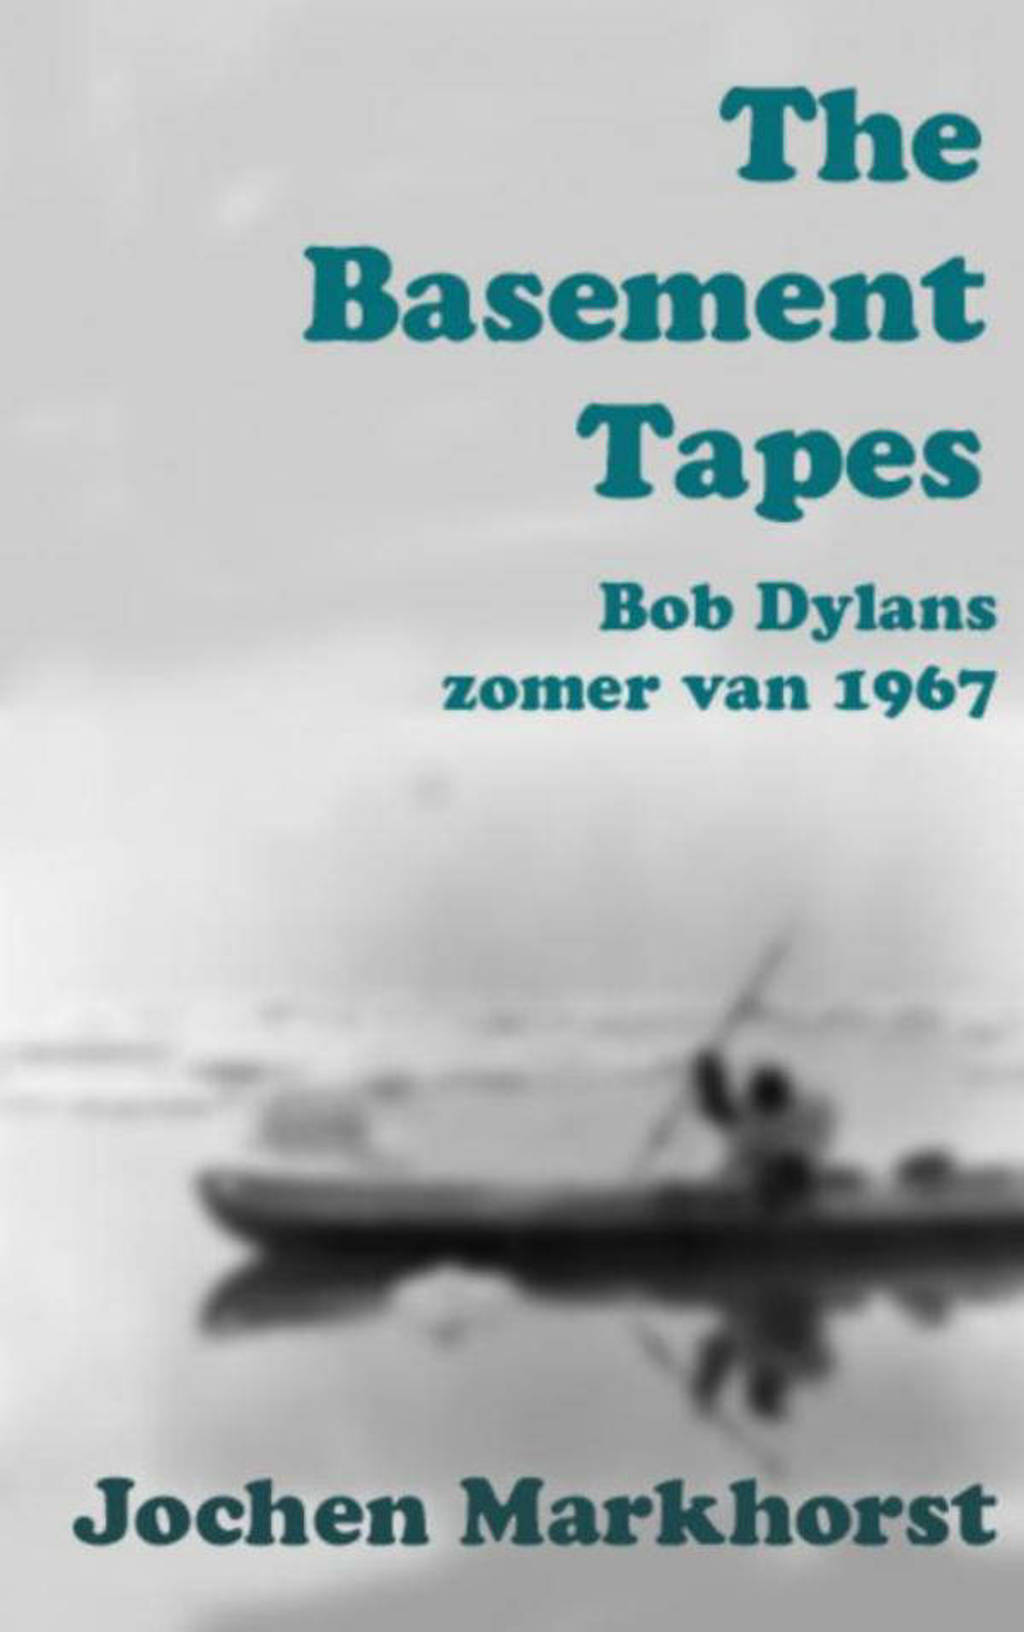 The Basement Tapes - Jochen Markhorst